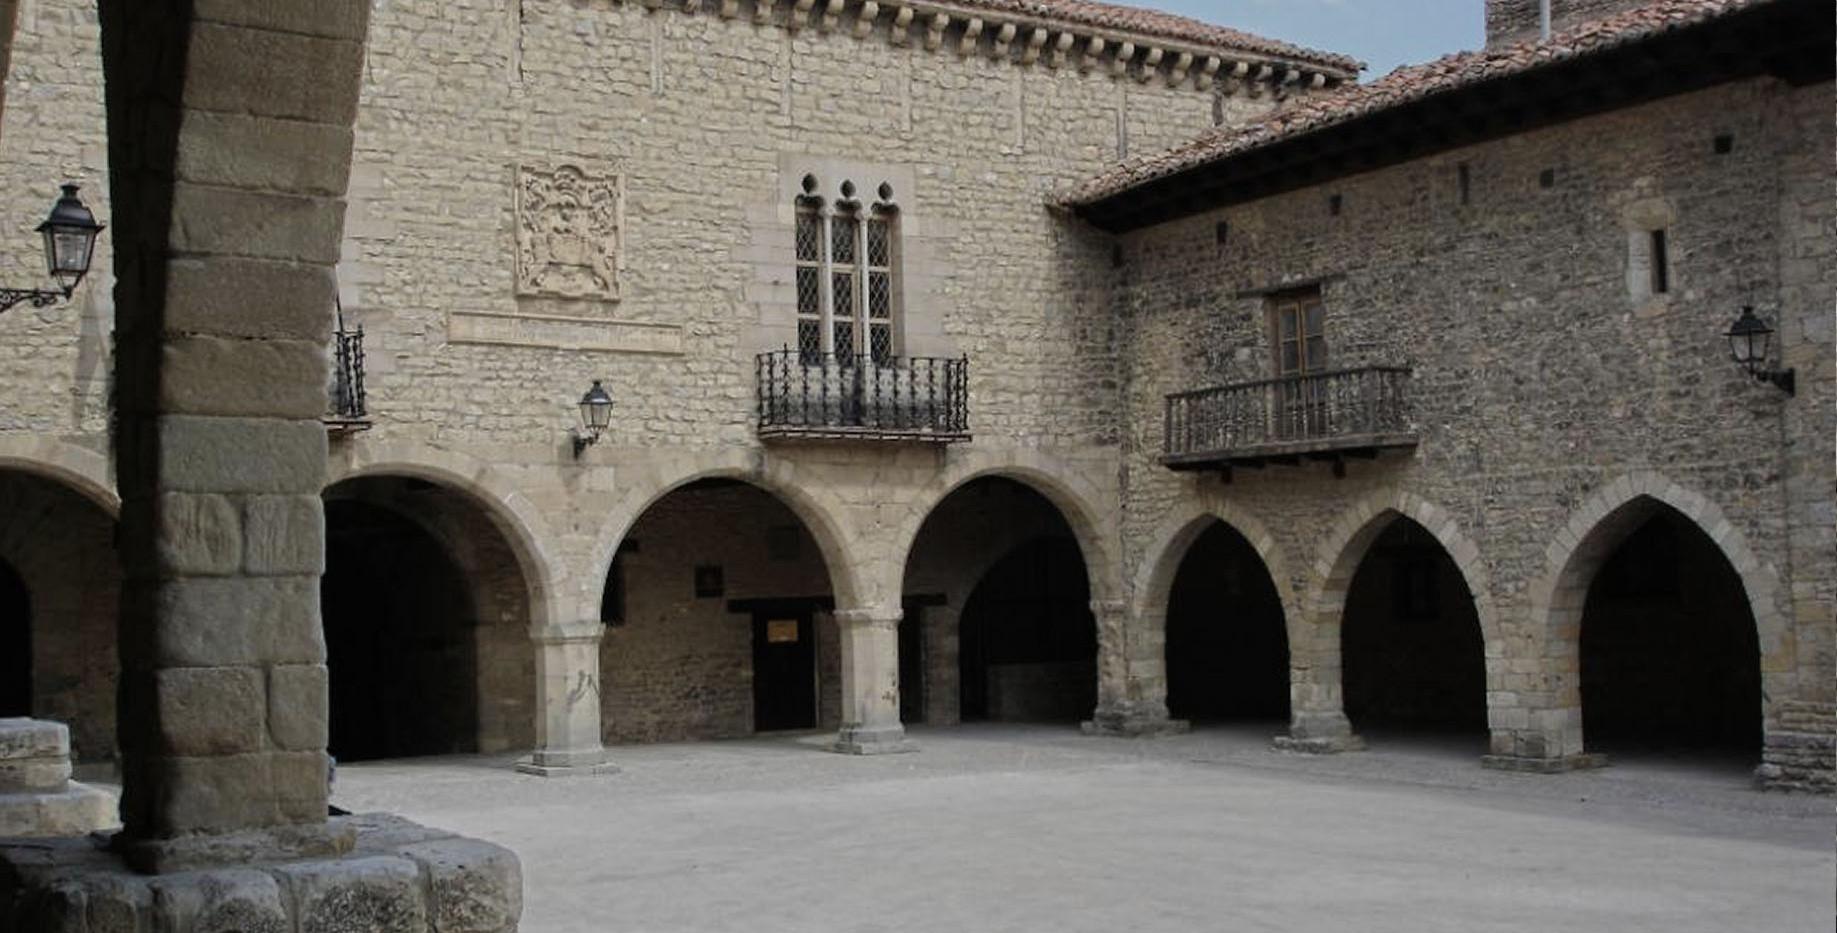 Rueda en Teruel-Shoot in Teruel- Cantavieja